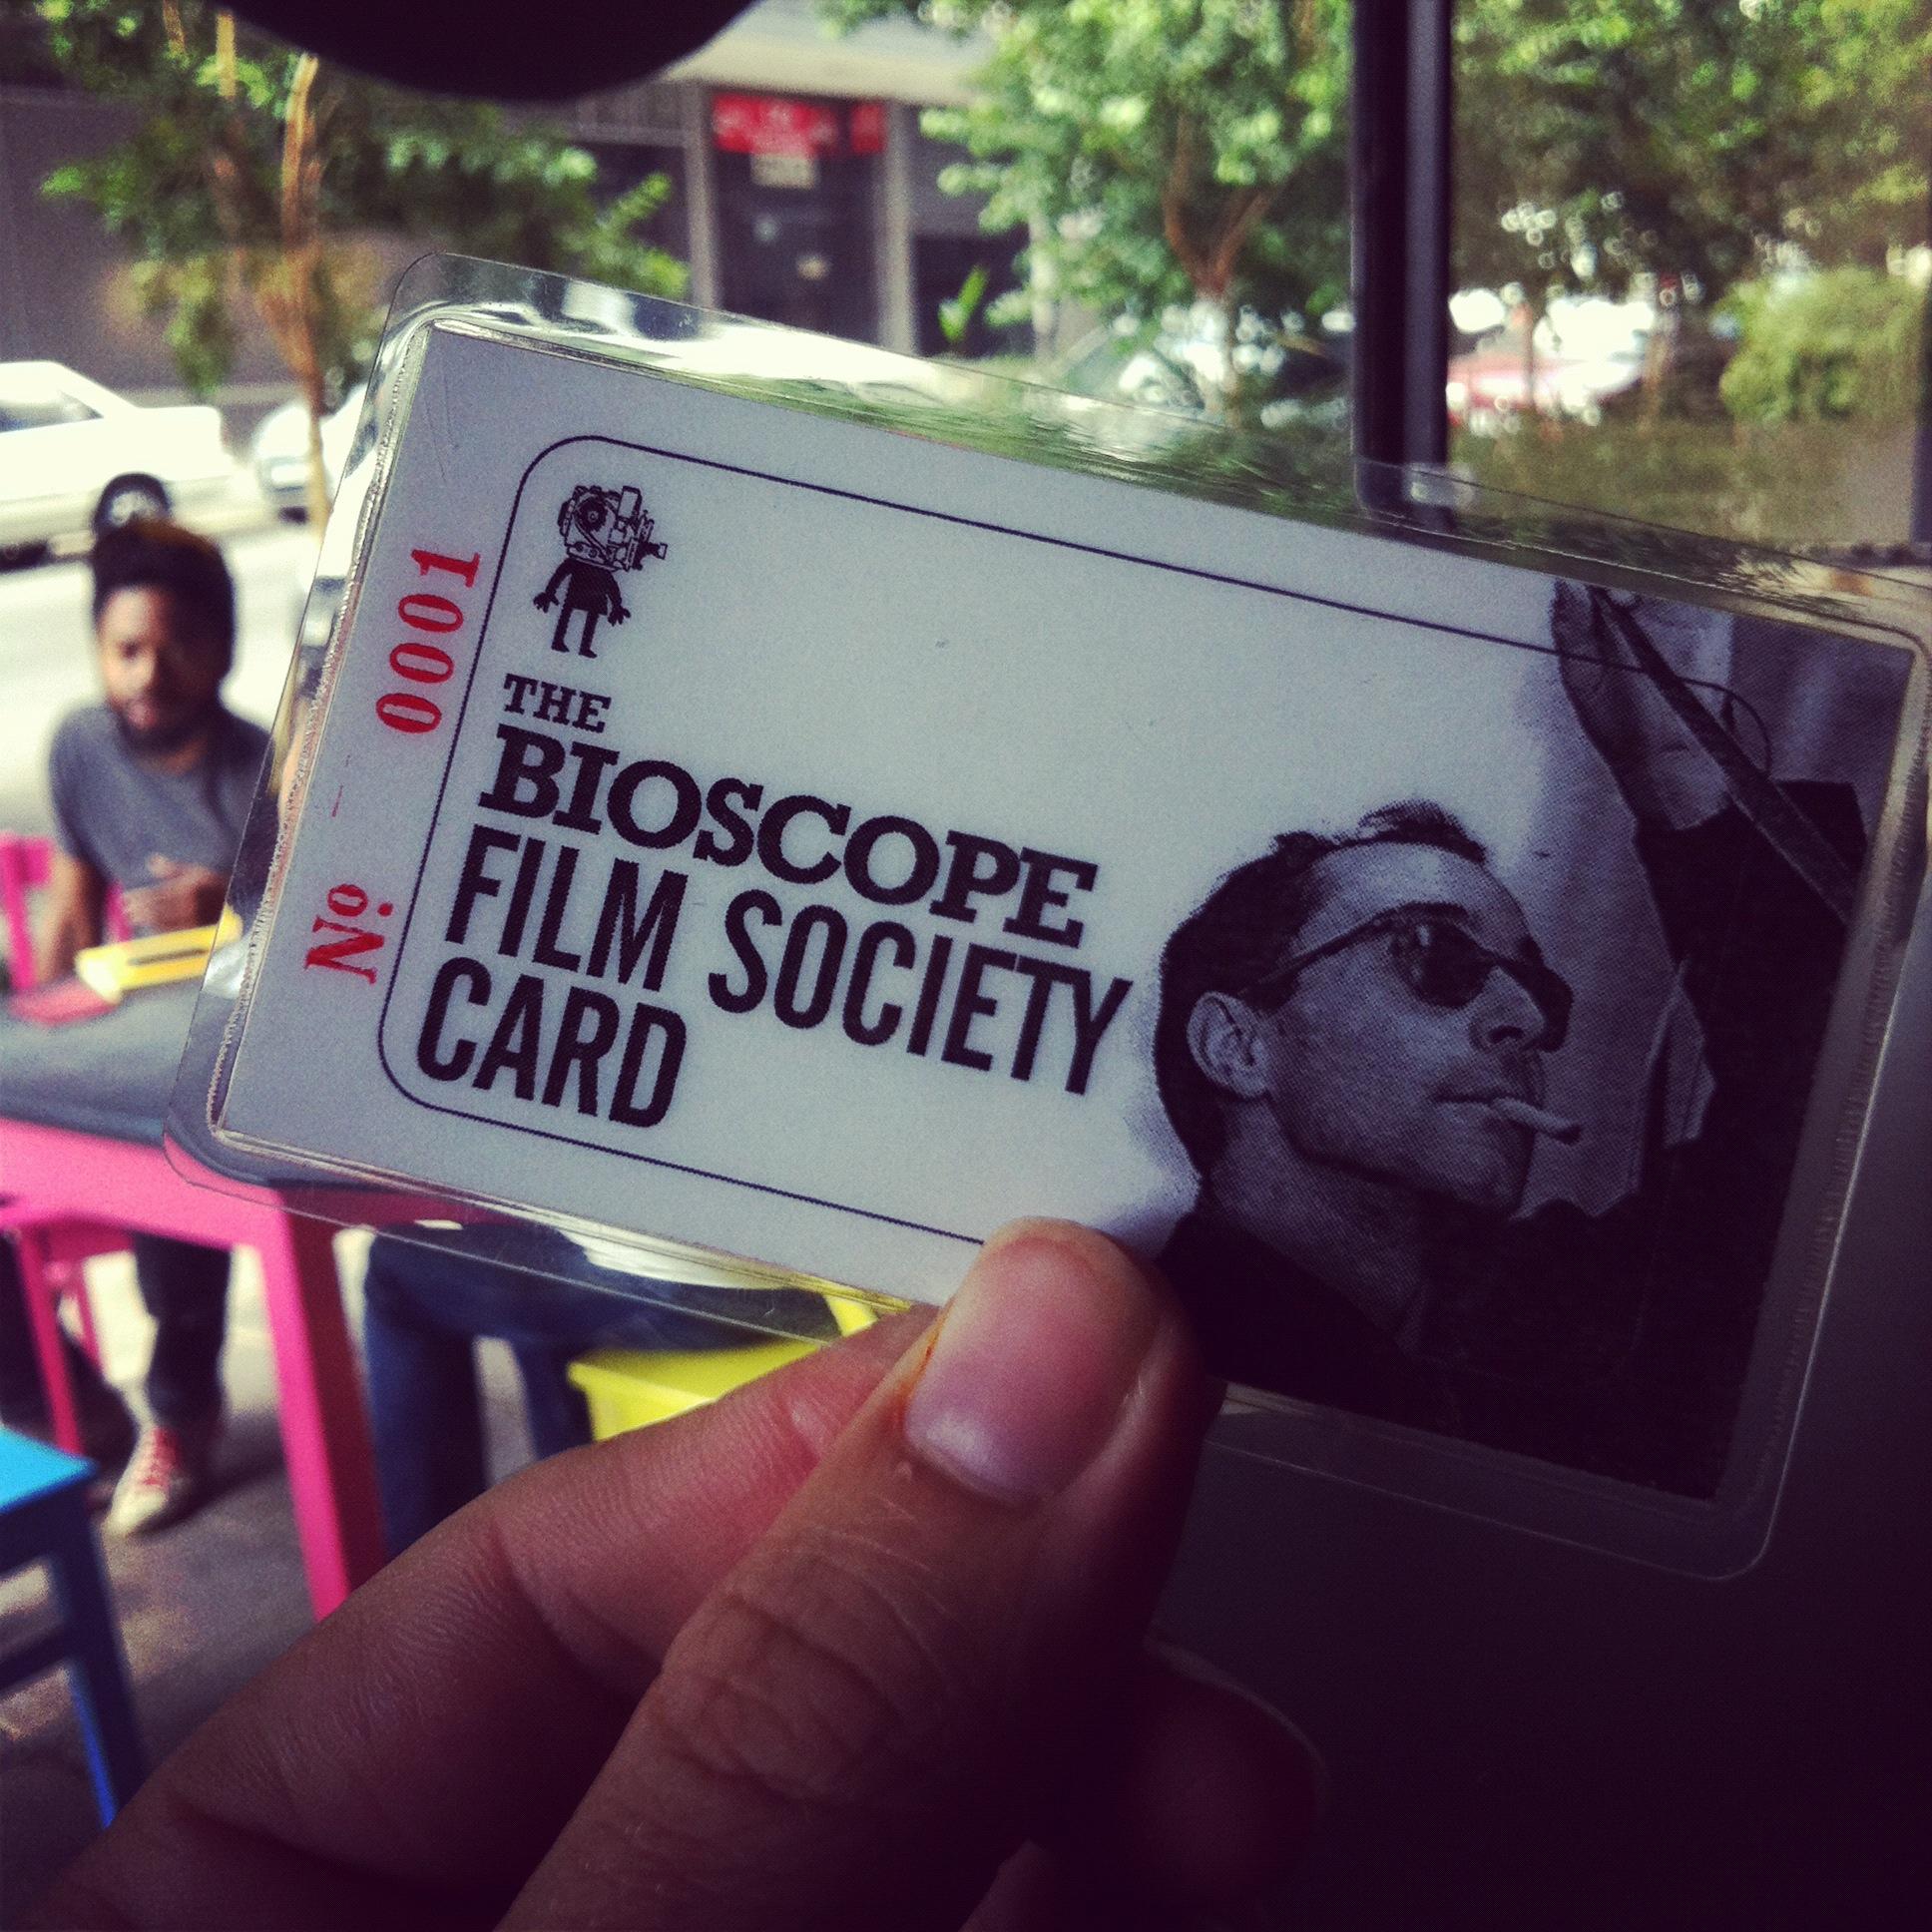 Bioscope Film Society Card